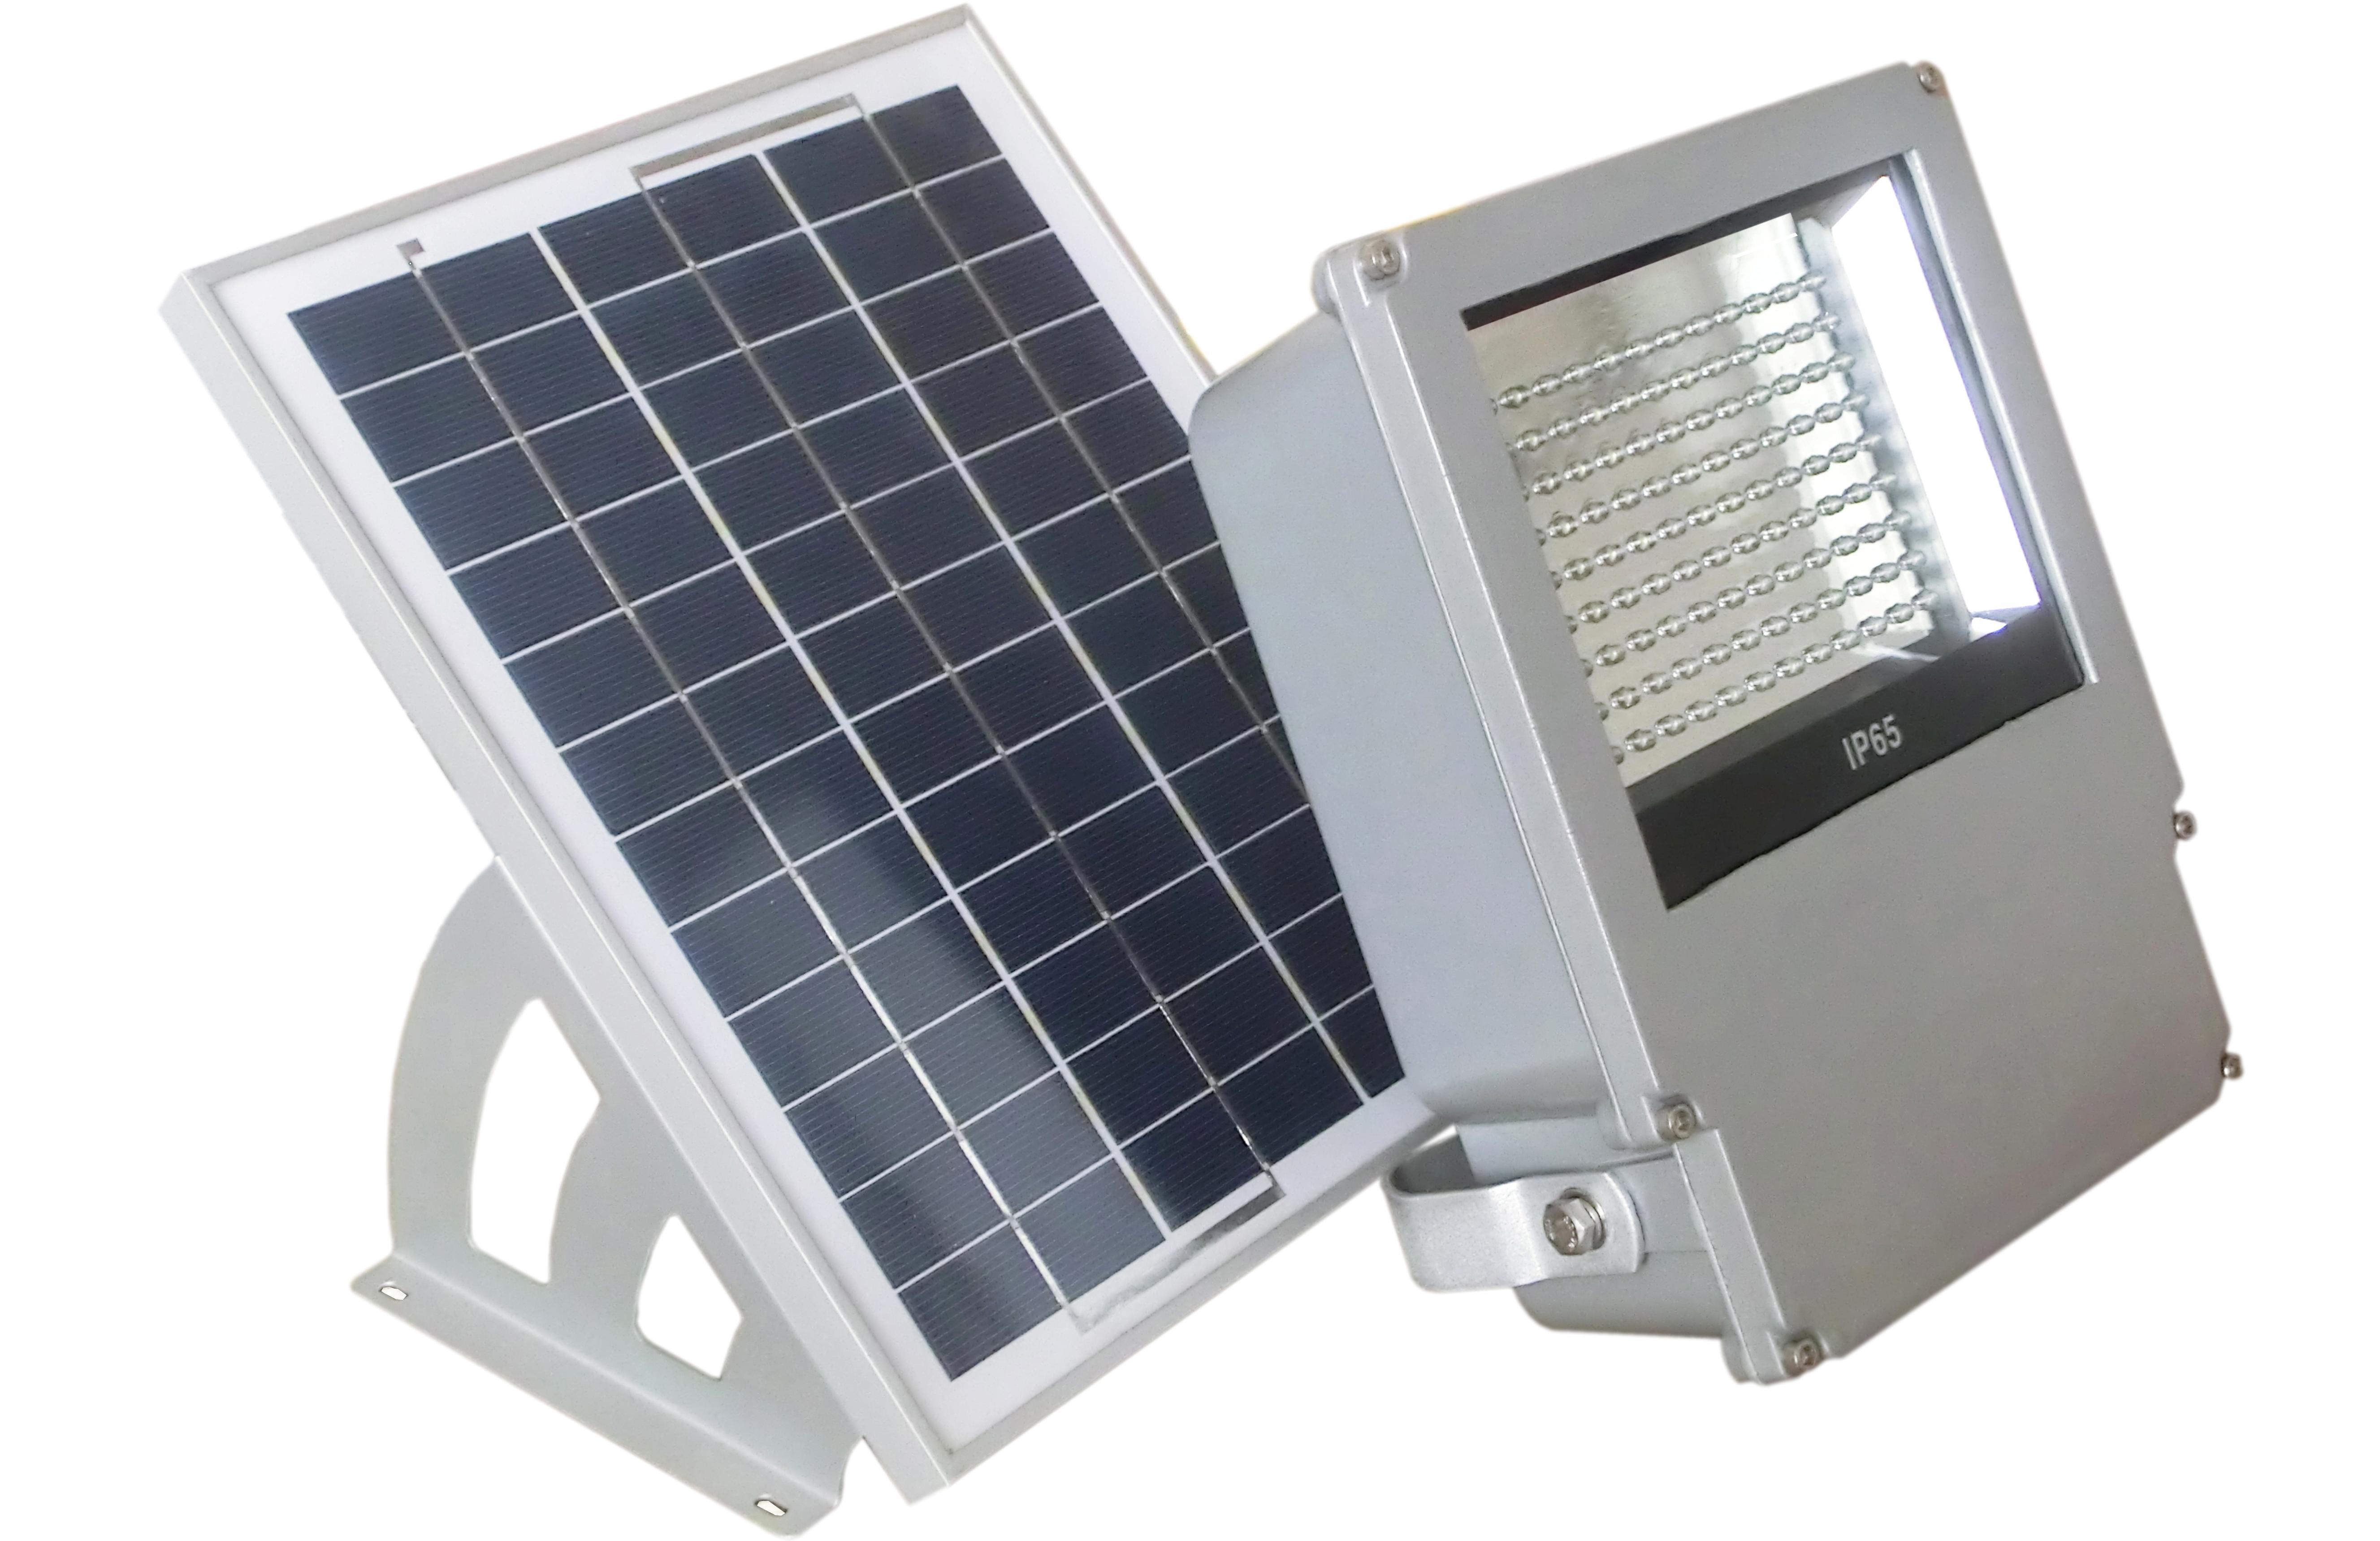 Outdoor Lighting Outstanding Outside Led Flood Light: 108 LED Outdoor Solar Powered Wall Mount Flood Light